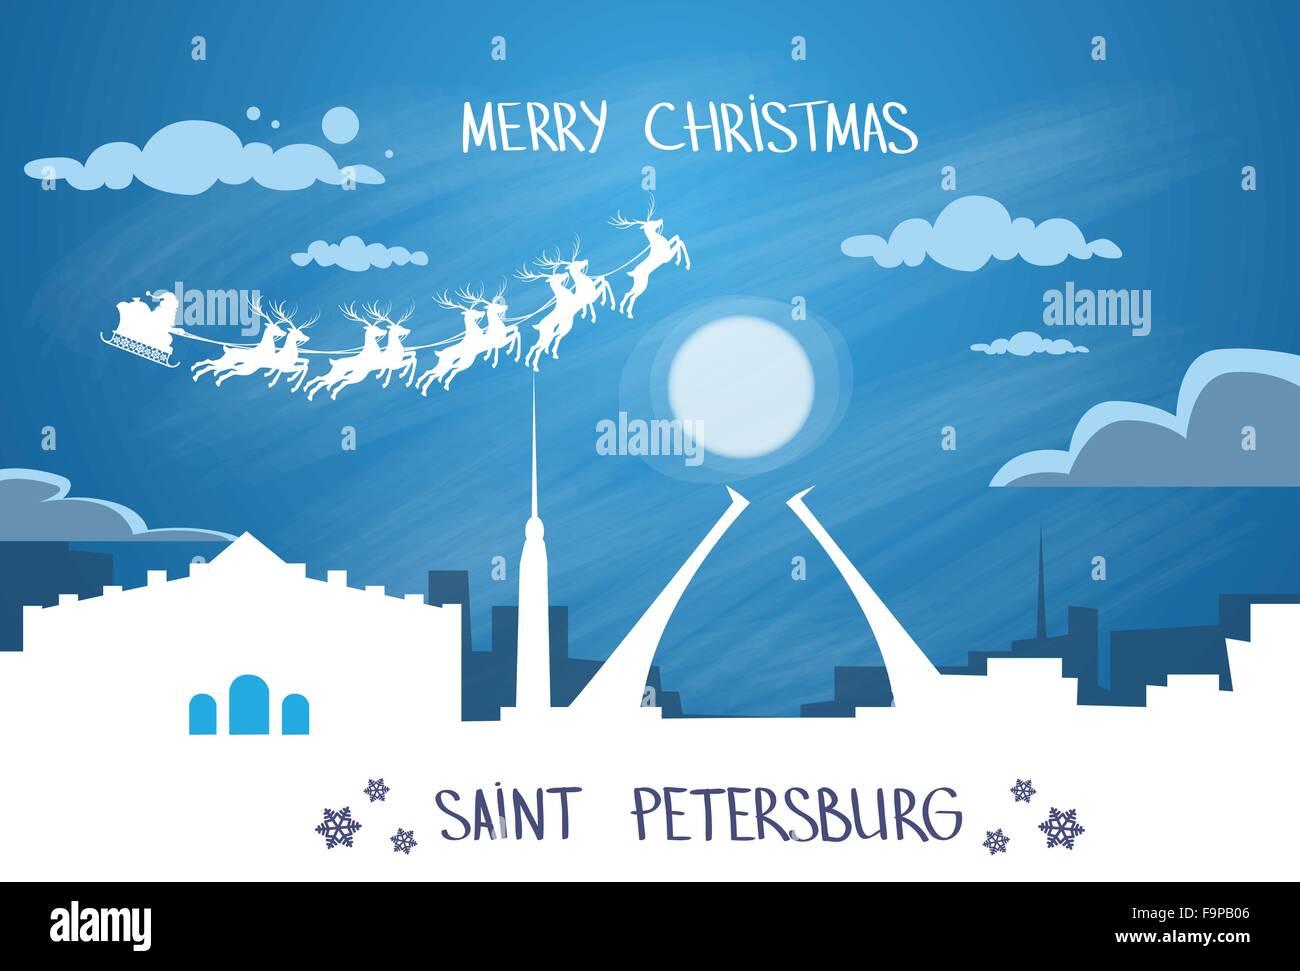 Santa Claus Sleigh Reindeer Fly Russian Sky over Saint Petersburg City Silhouette - Stock Image